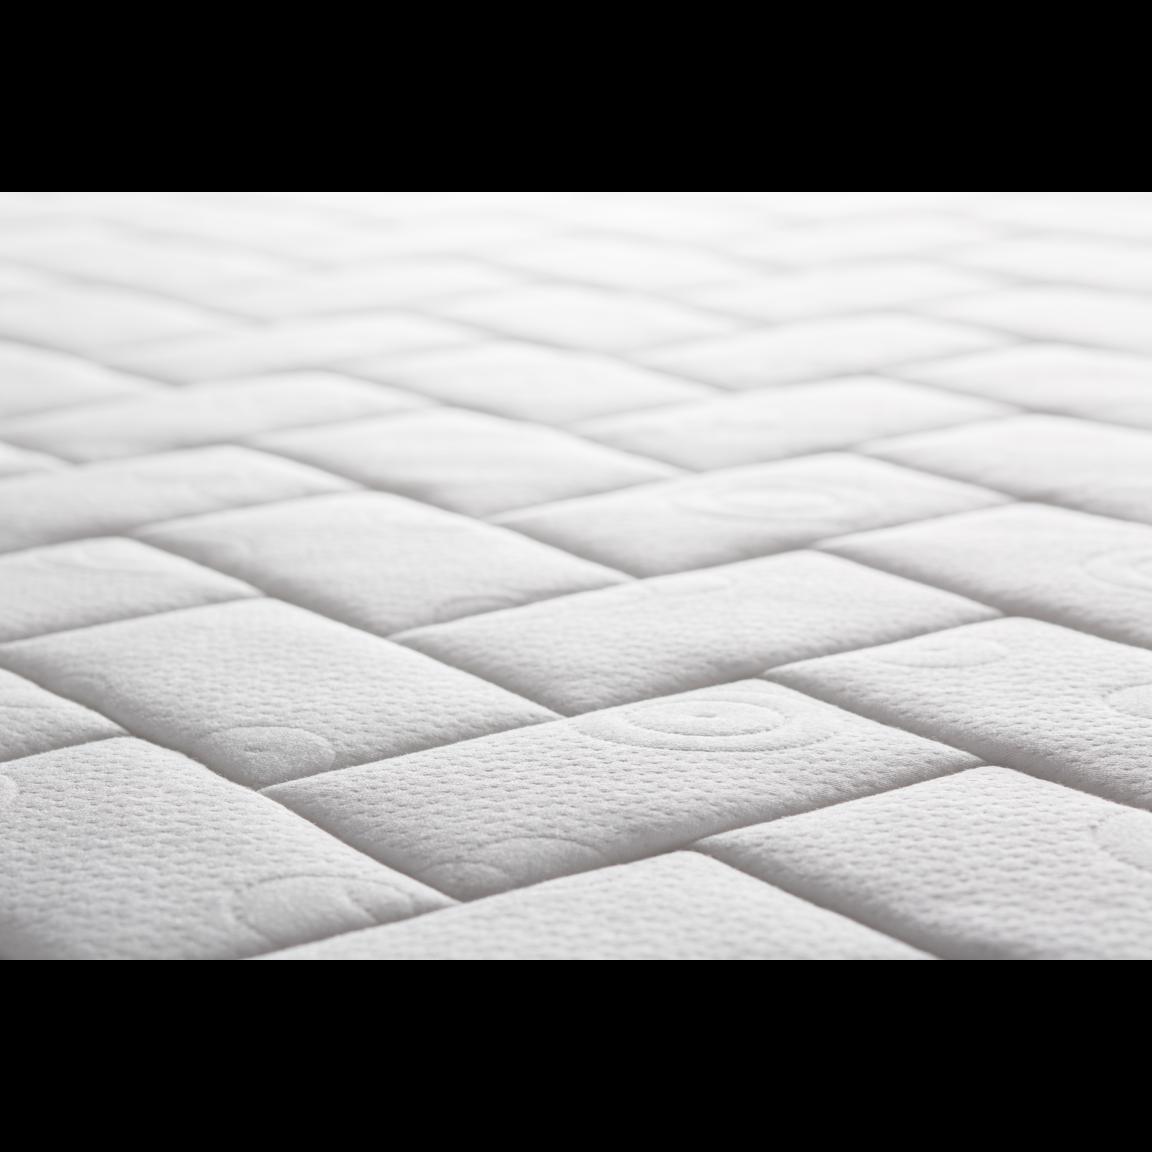 Matratzenauflage/-topper | Topaze-90x190 cm